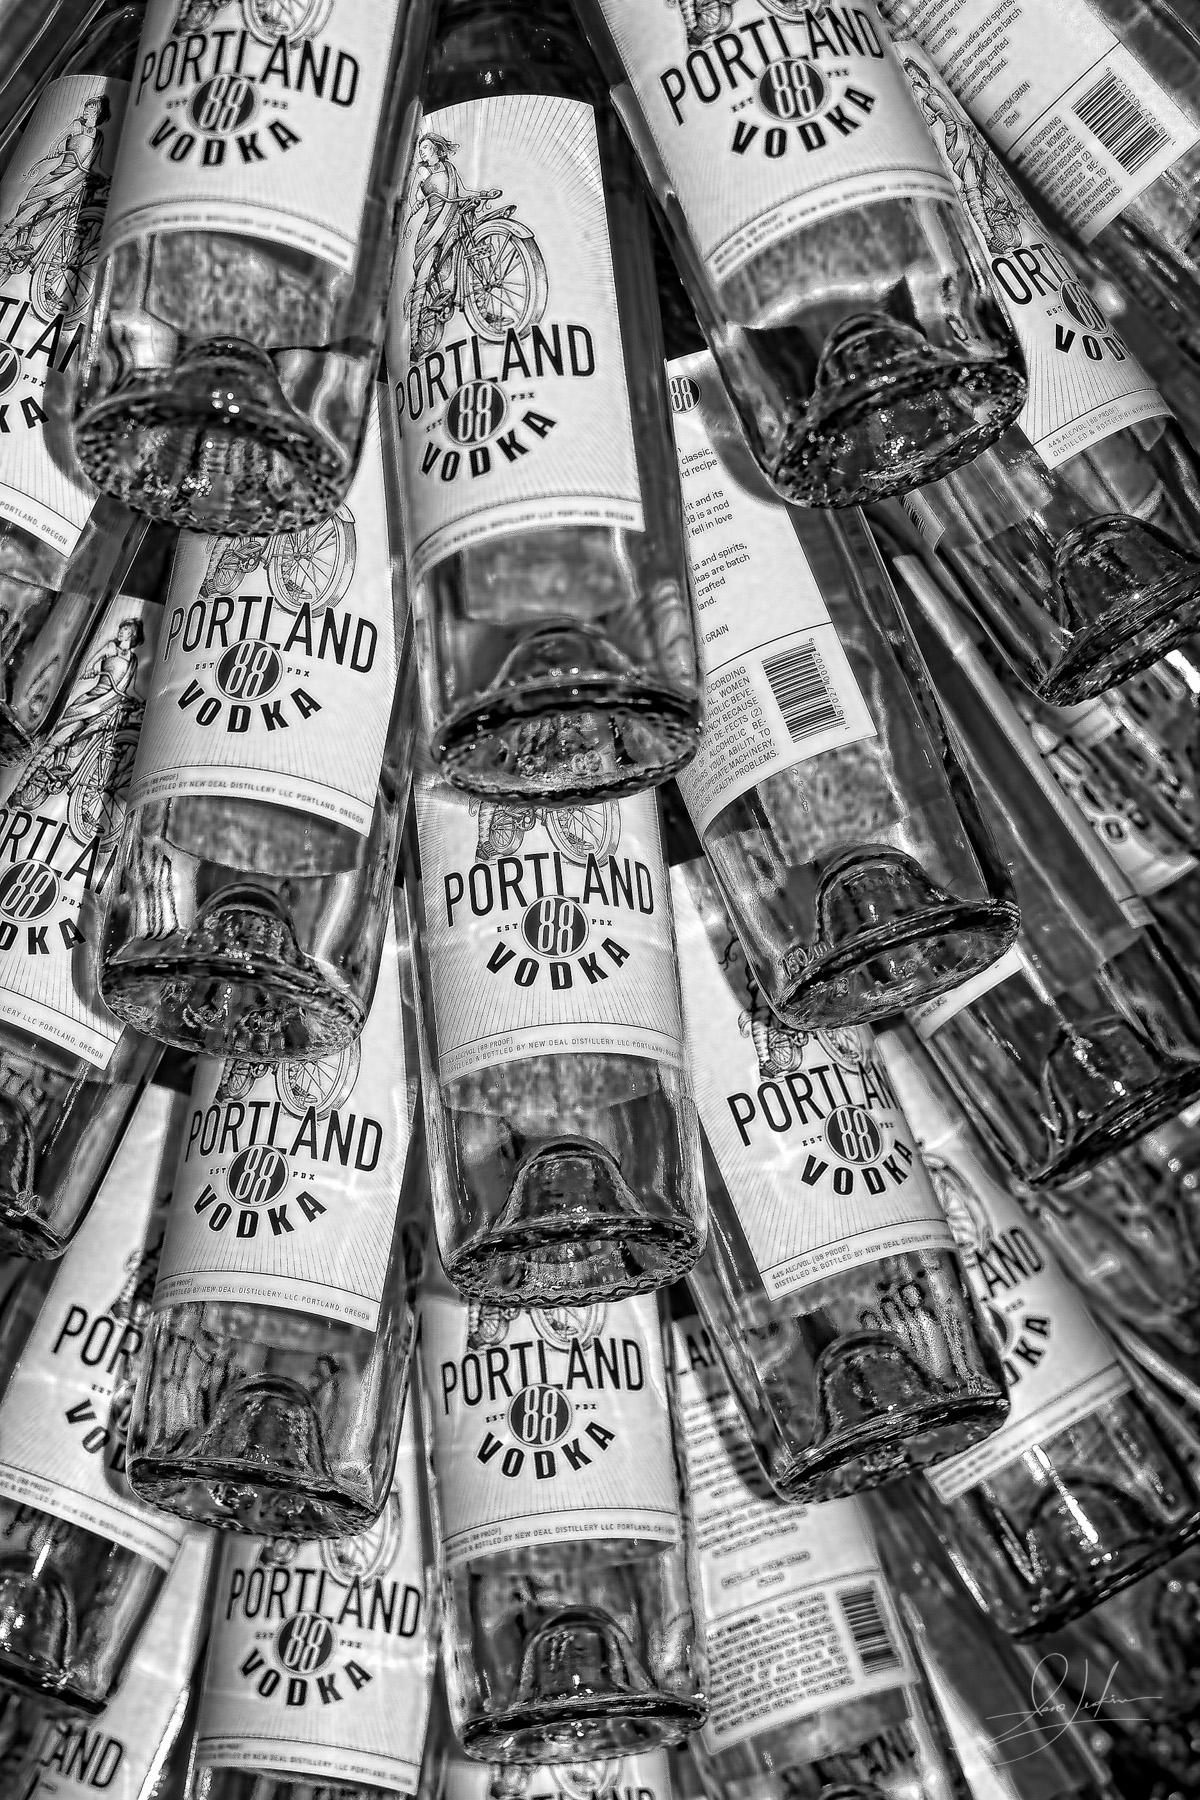 Worldwide Photowalk Distillery Tour Bottle Tree